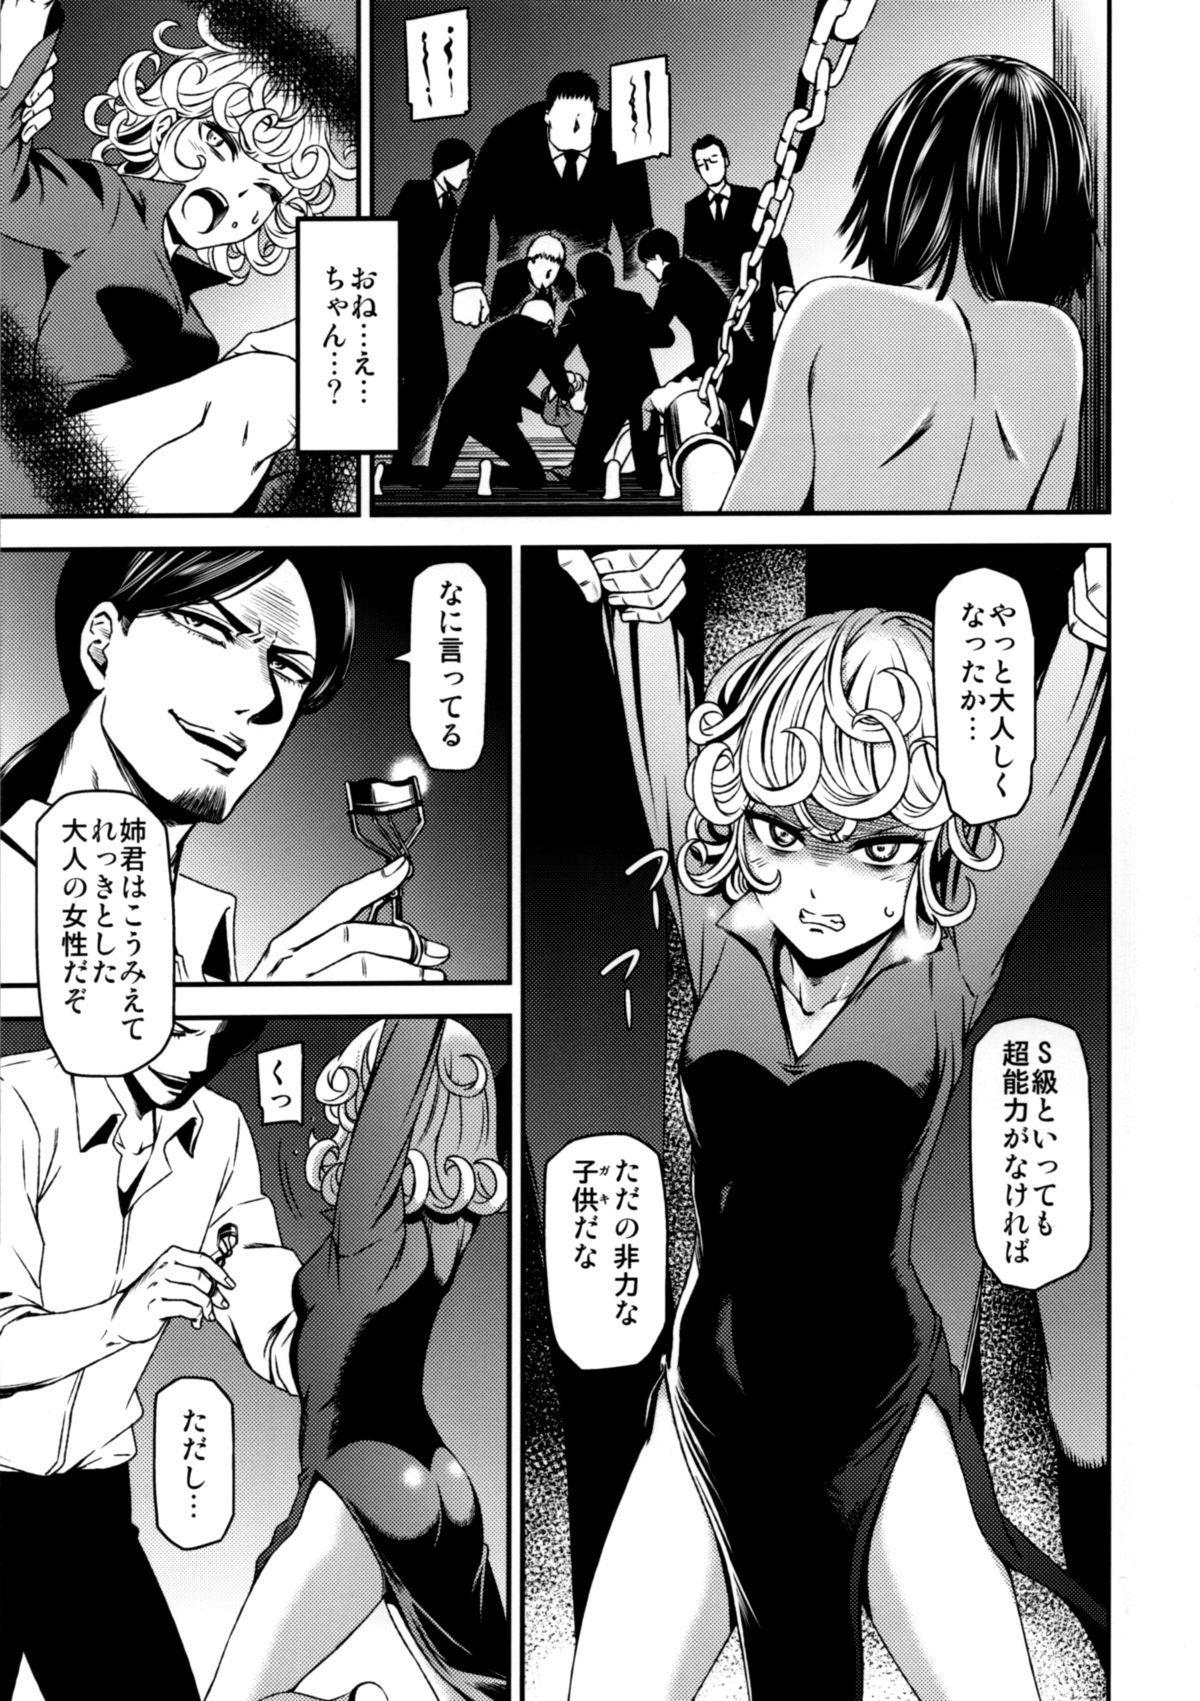 (C89) [Kiyosumi Hurricane (Kiyosumi Hurricane)] ONE-HURRICANE - Kutsujoku no Tatsumaki (One Punch Man) 3